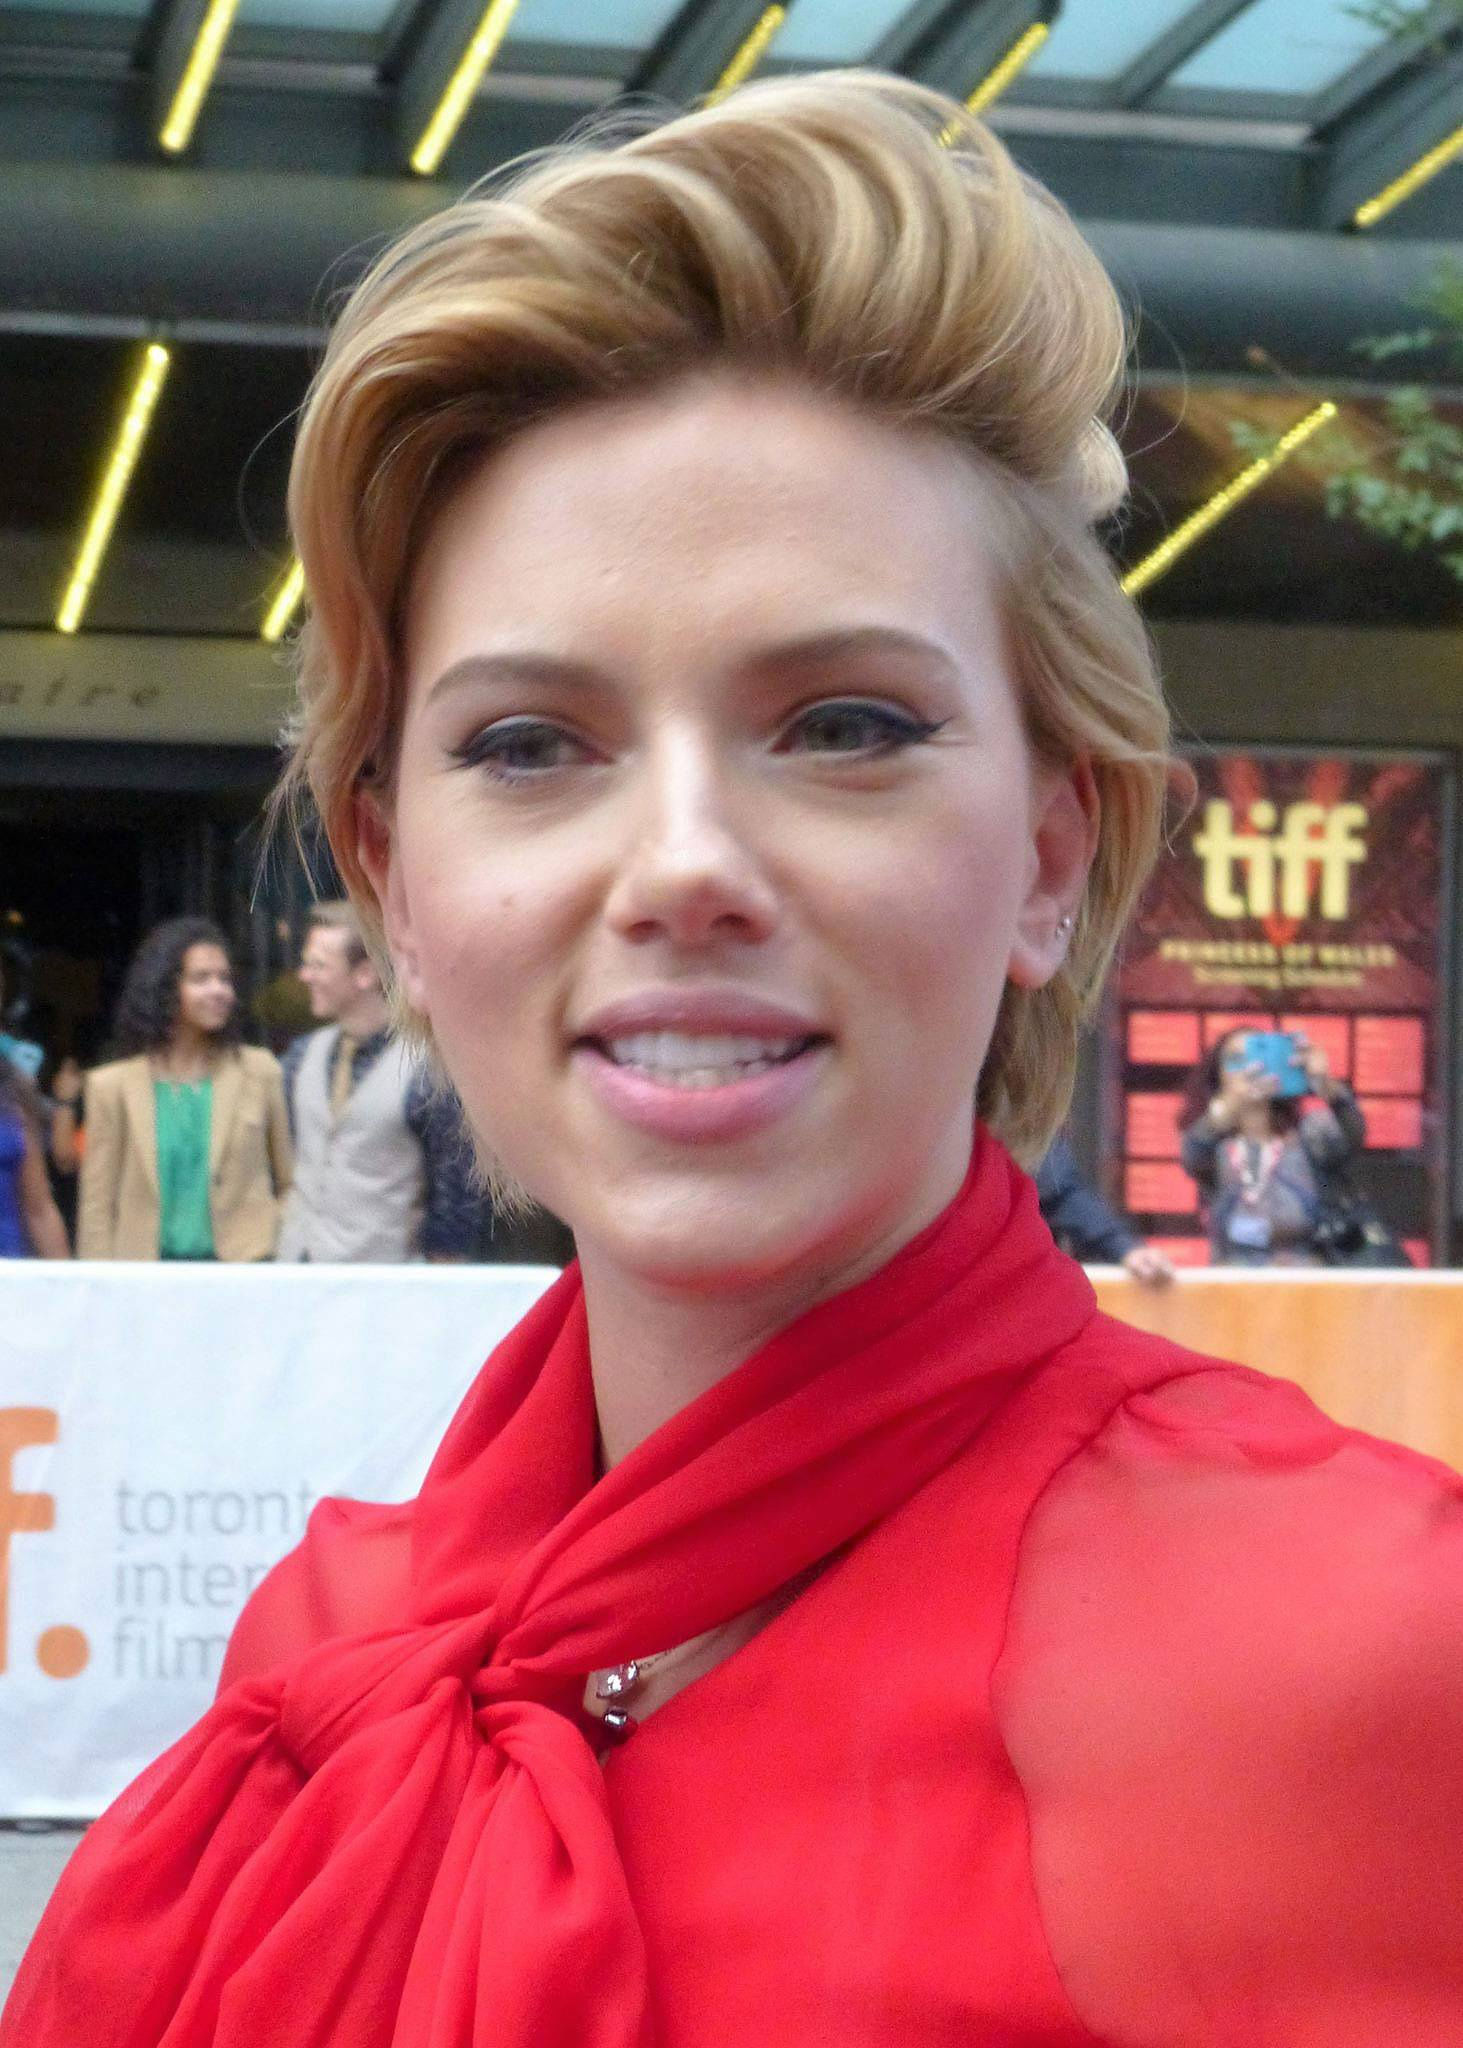 Photo of Scarlett Johansson: American actress, model, and singer